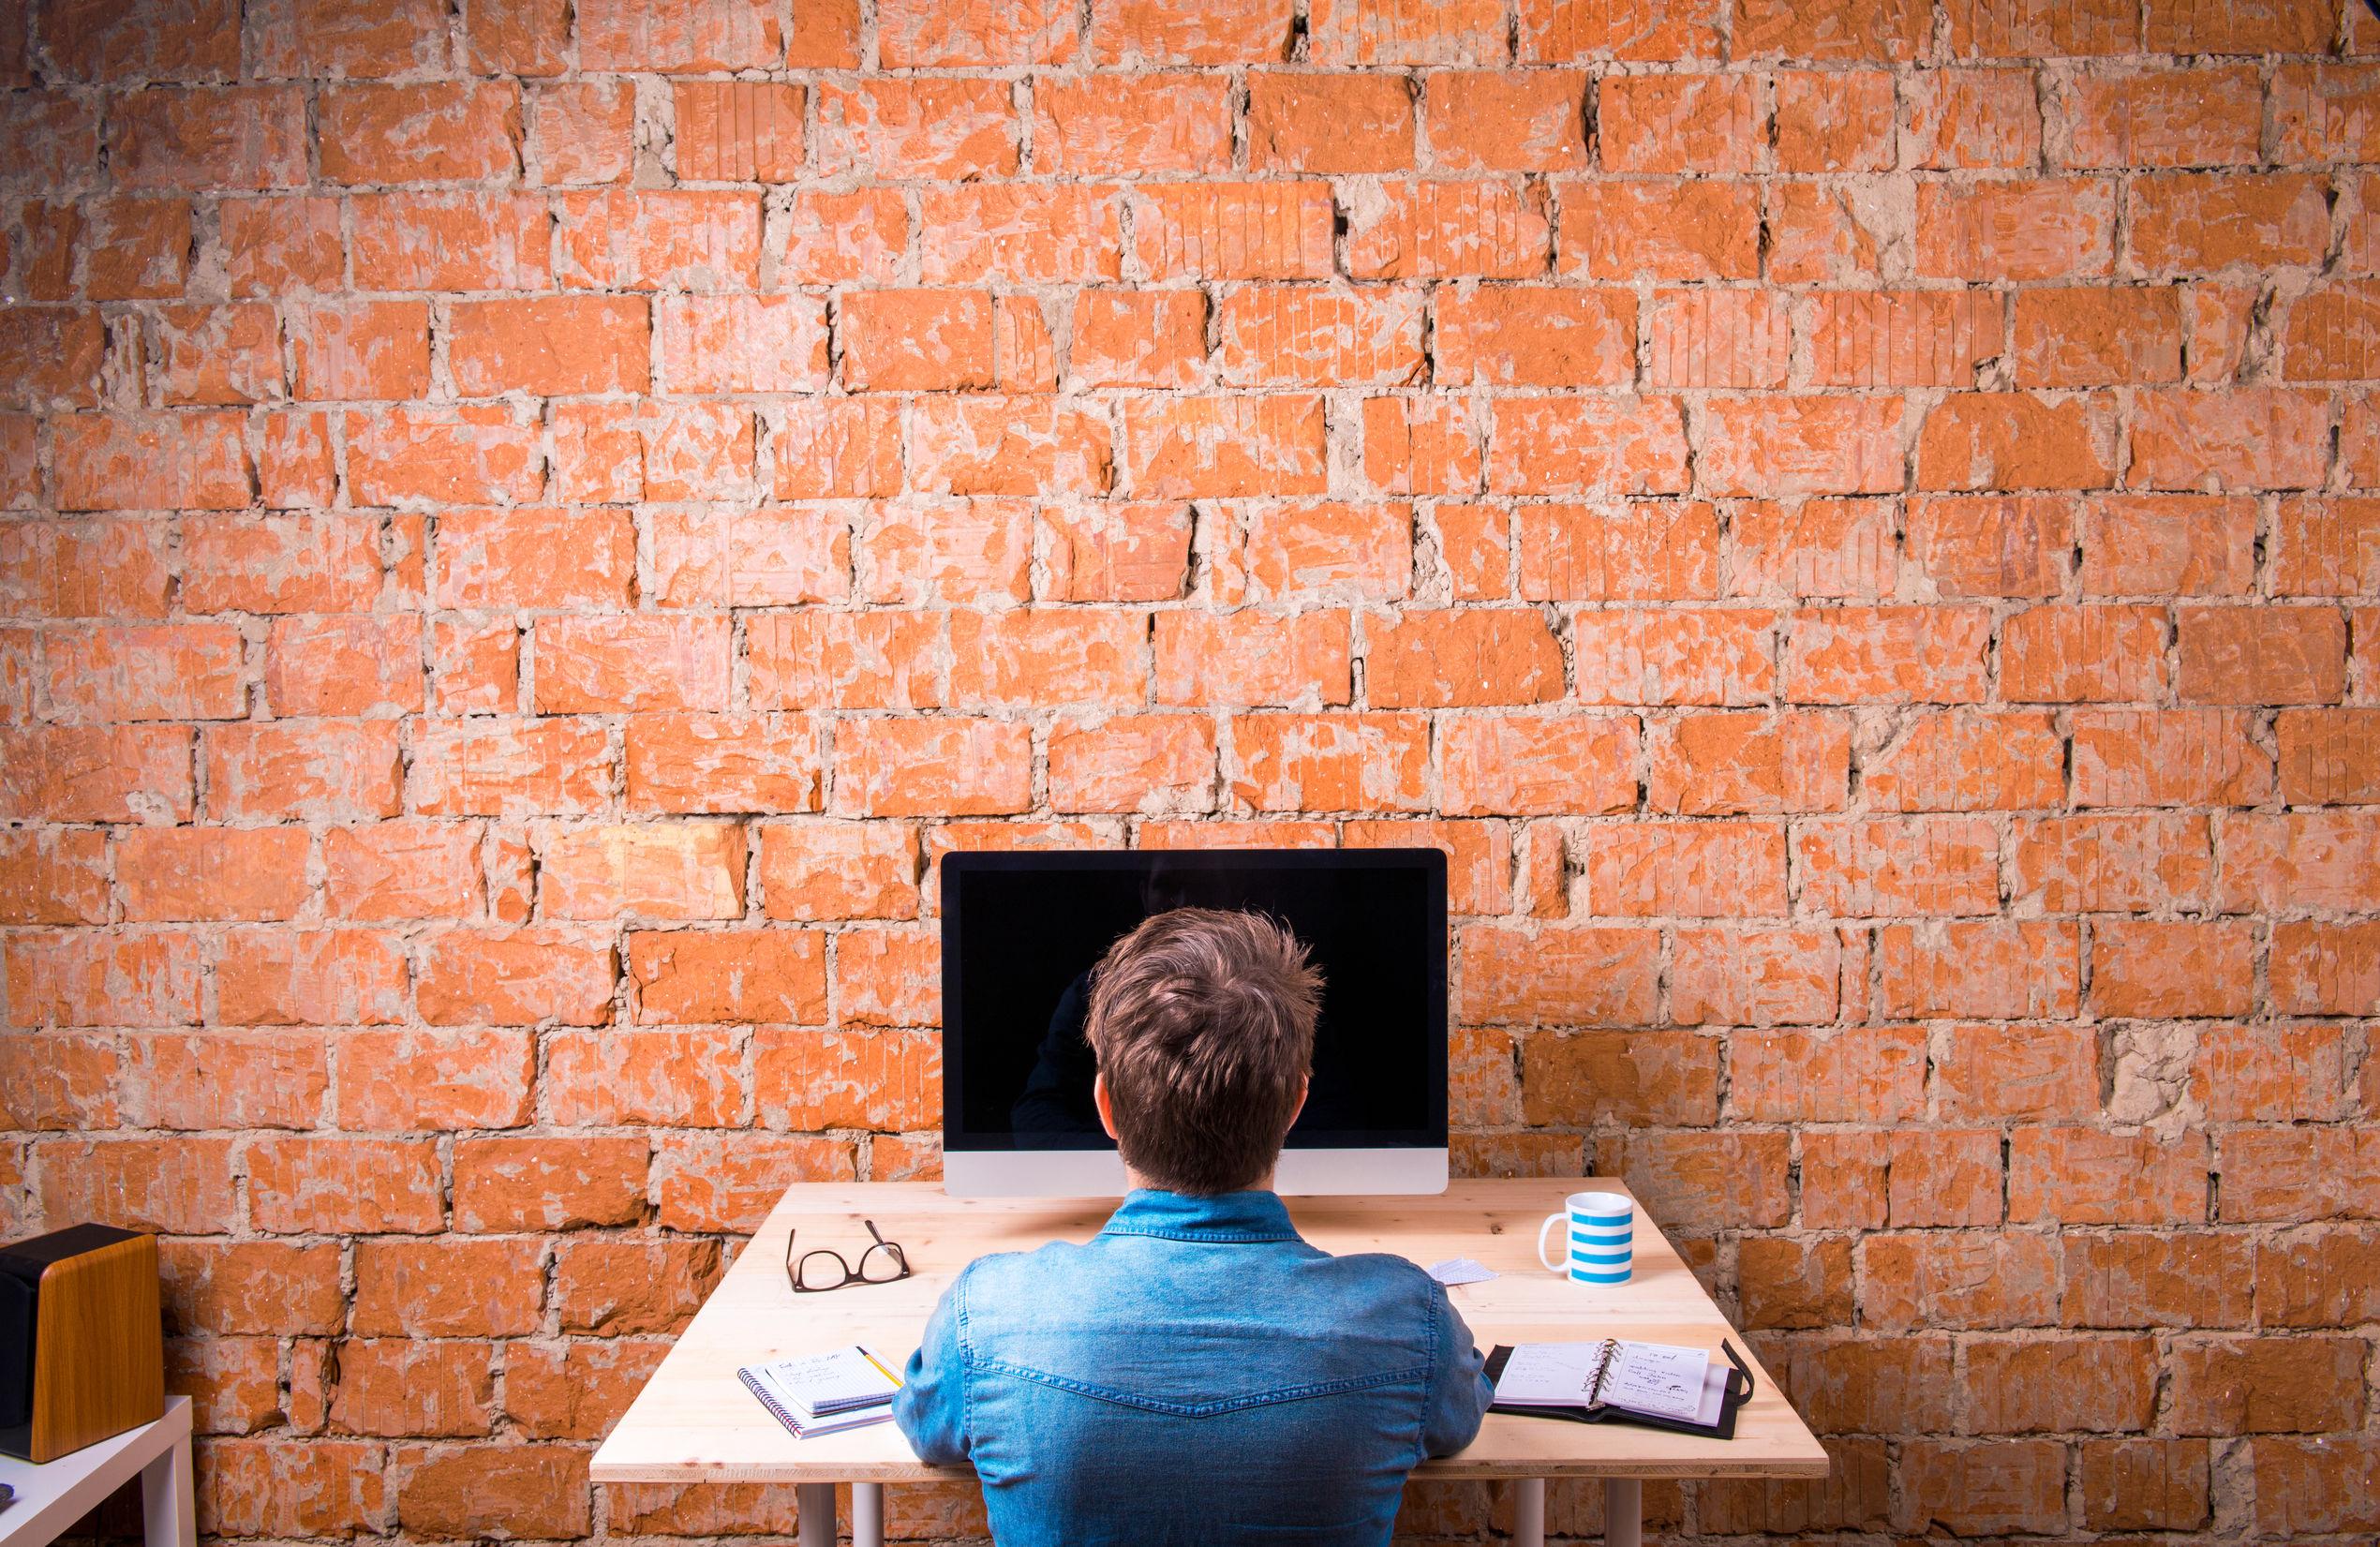 Man building an affordable website